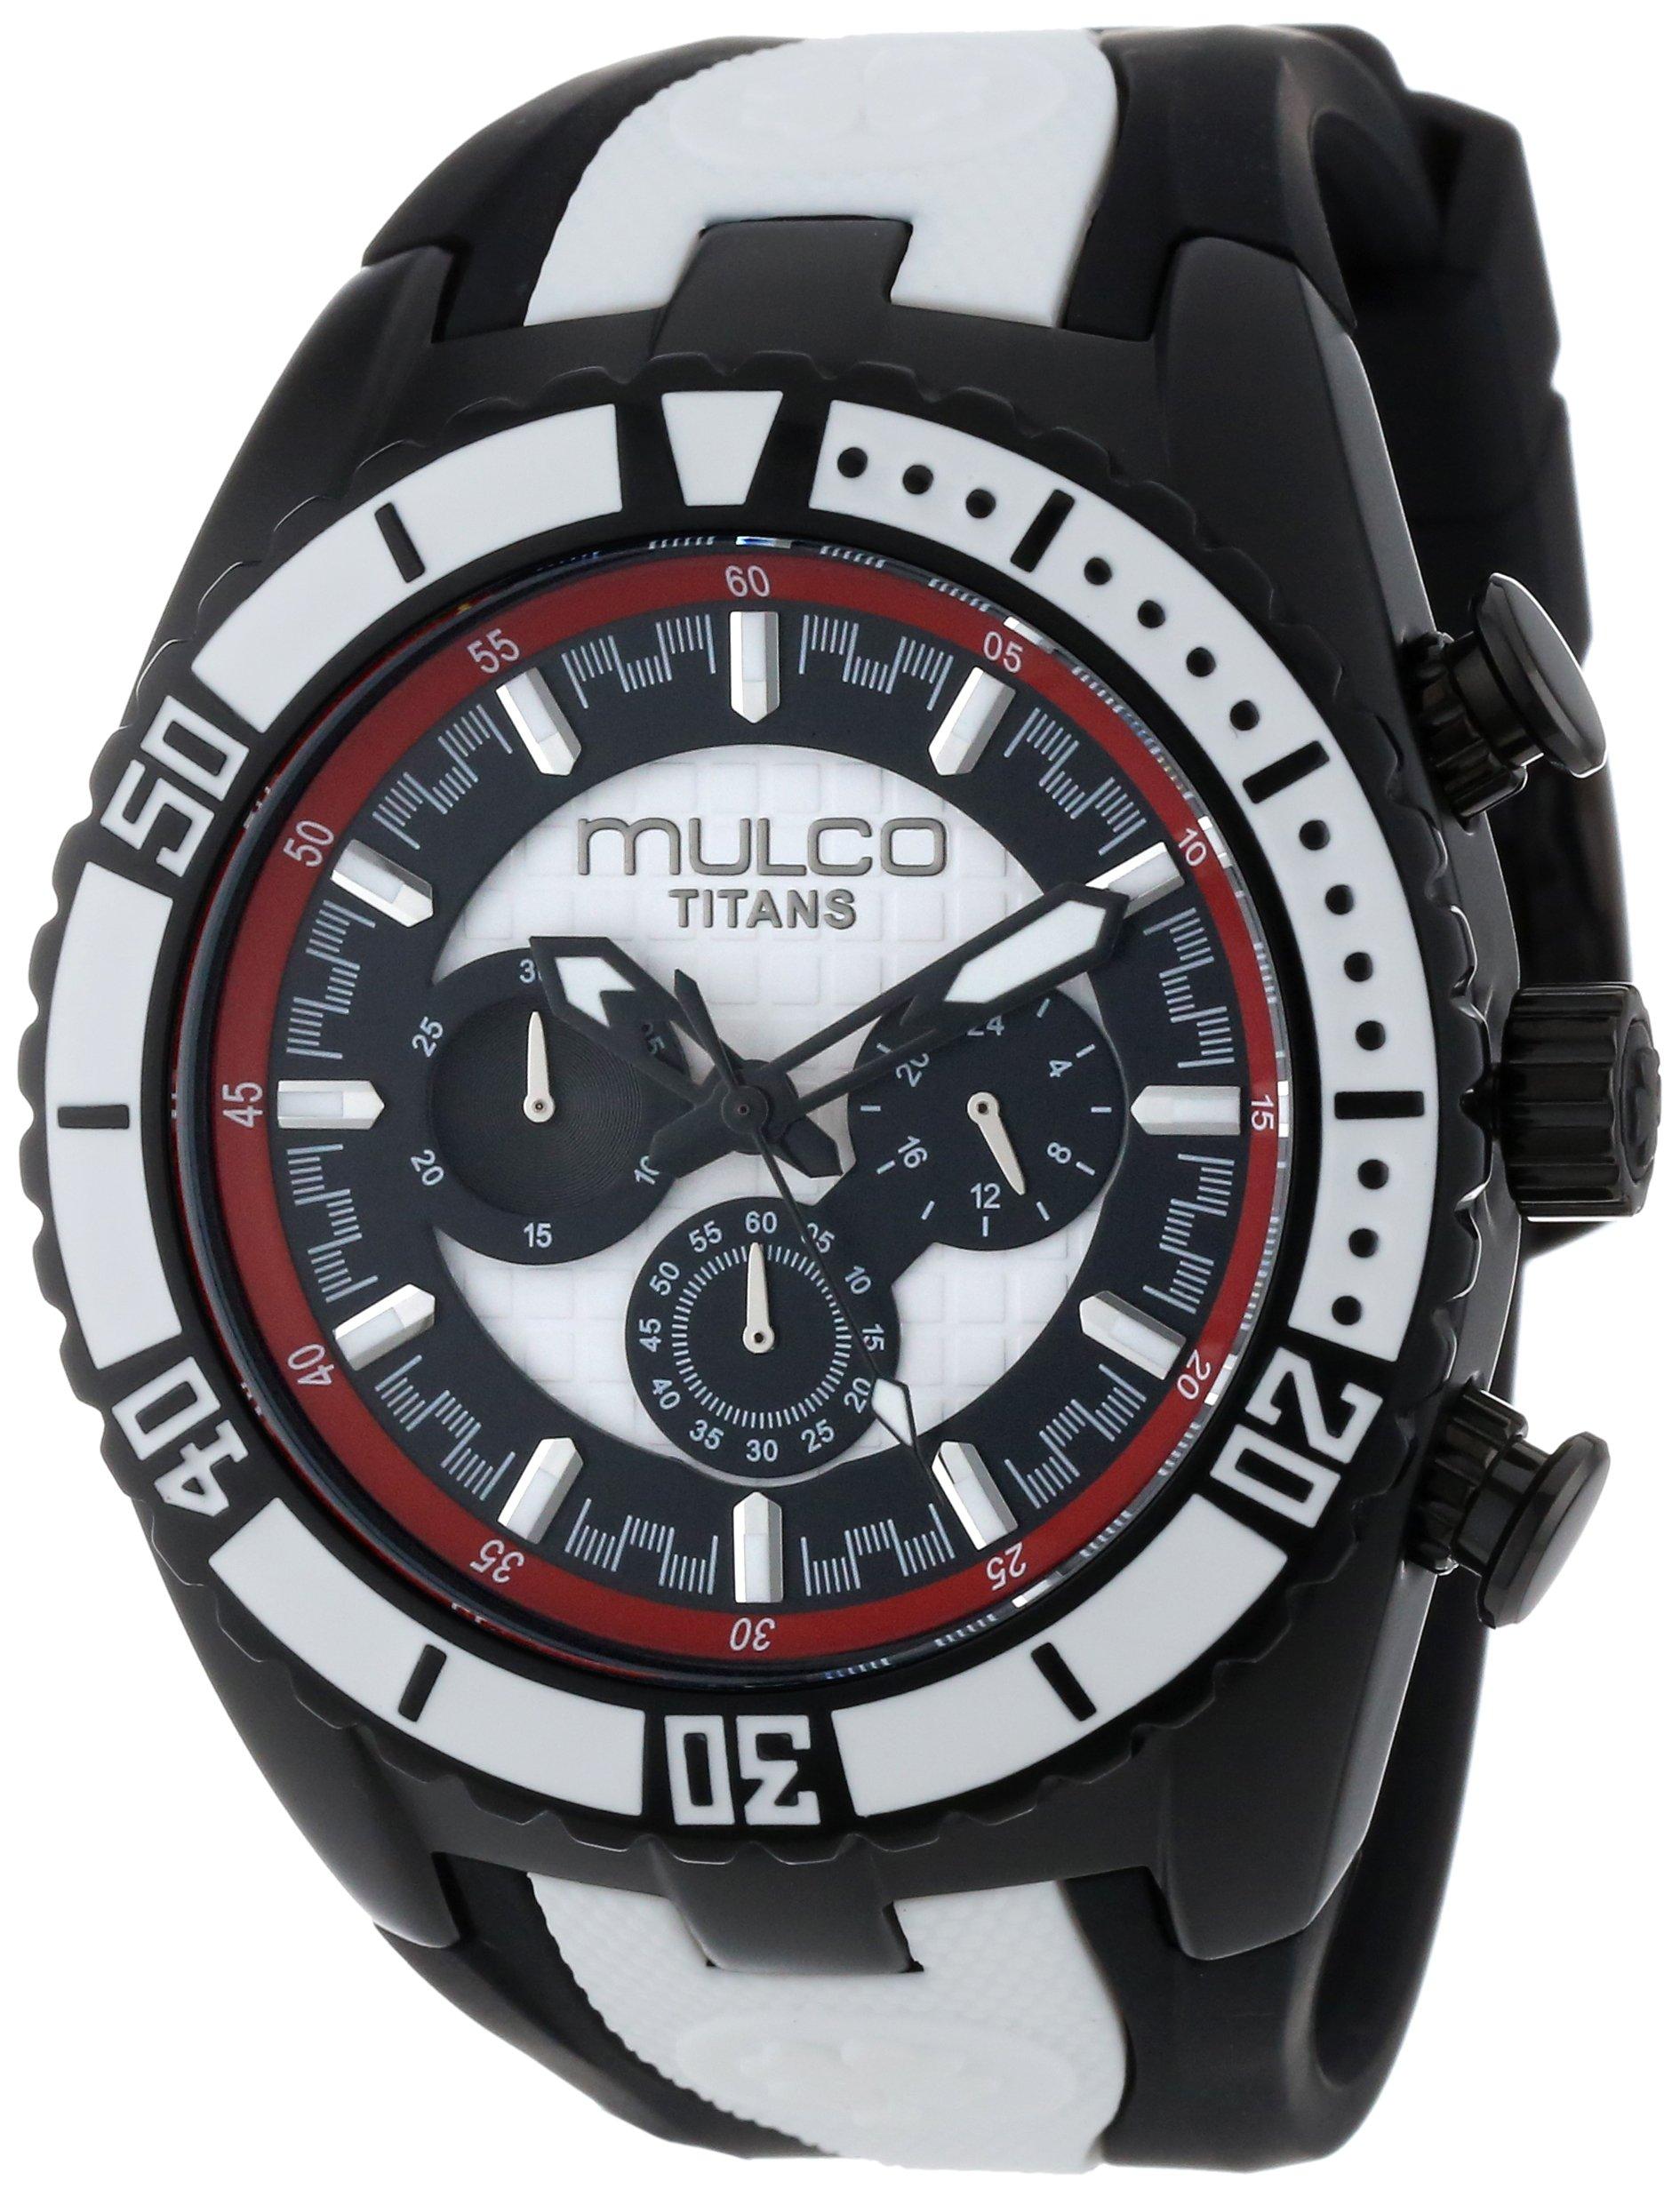 MULCO Unisex MW5-1836-026 Analog Chronograph Swiss Watch by MULCO